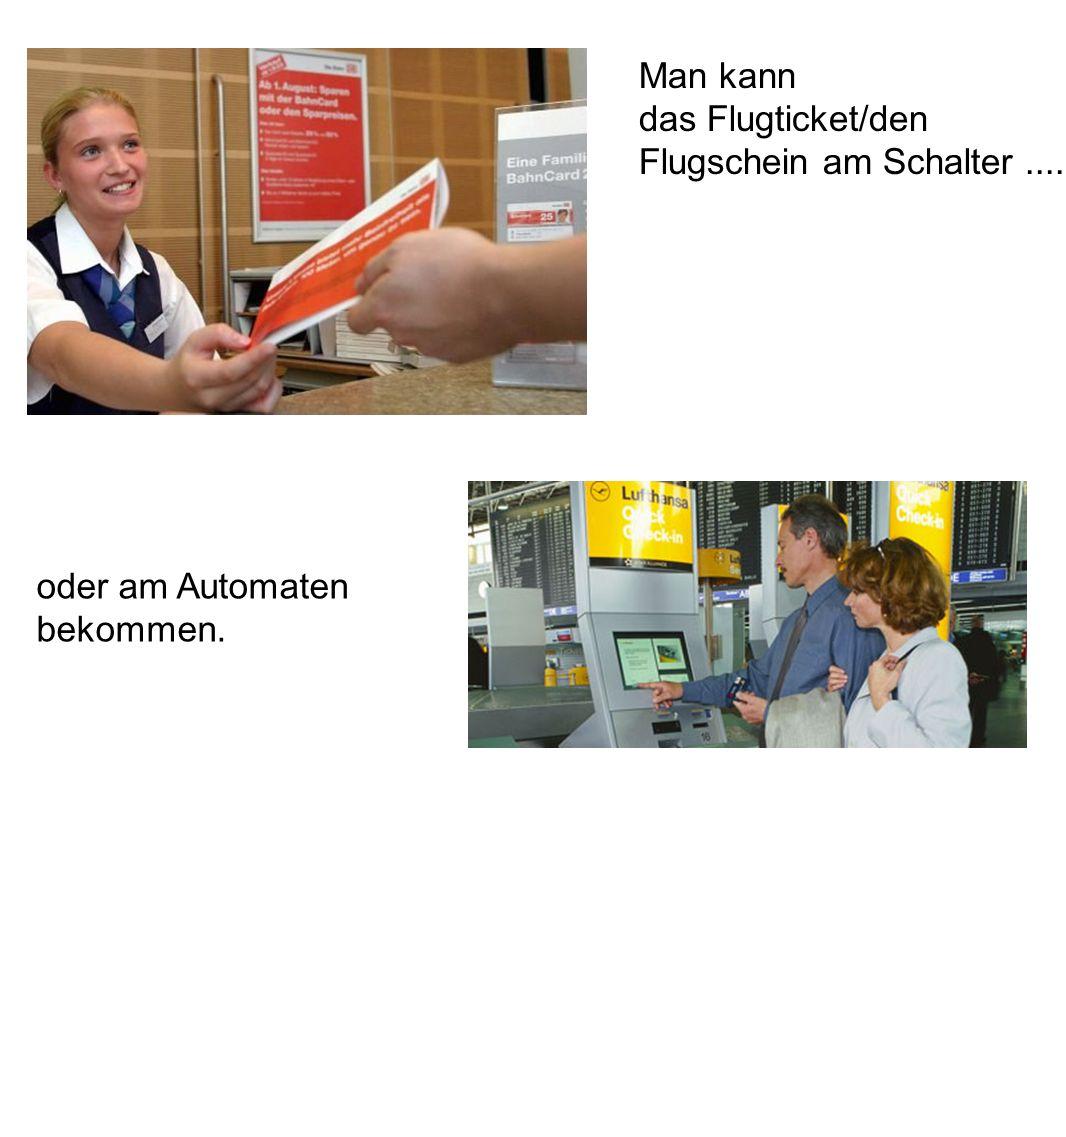 http://images.google.de/imgres?q=kudamm&num=10&hl=de&safe=active&tbo=d&tbm=isch&tbnid=WDQle- T1fXXlzM:&imgrefurl=http://www.berlin- audiovisuell.de/sehenswertes/kurfuerstendamm/index.php&docid=VPgGcENk0tDCPM&imgurl=http://www.berlin- audiovisuell.de/images/kudamm_mg_6899.jpg&w=800&h=533&ei=UjIAUZXgJ9PHqAGCu4CYBg&zoom=1&iact=hc& vpx=137&vpy=68&dur=141&hovh=183&hovw=275&tx=141&ty=104&sig=113284846695502237704&page=1&tbnh=1 28&tbnw=184&start=0&ndsp=14&ved=1t:429,r:6,s:0,i:99&biw=1015&bih=603 Berlin Audiovisuell